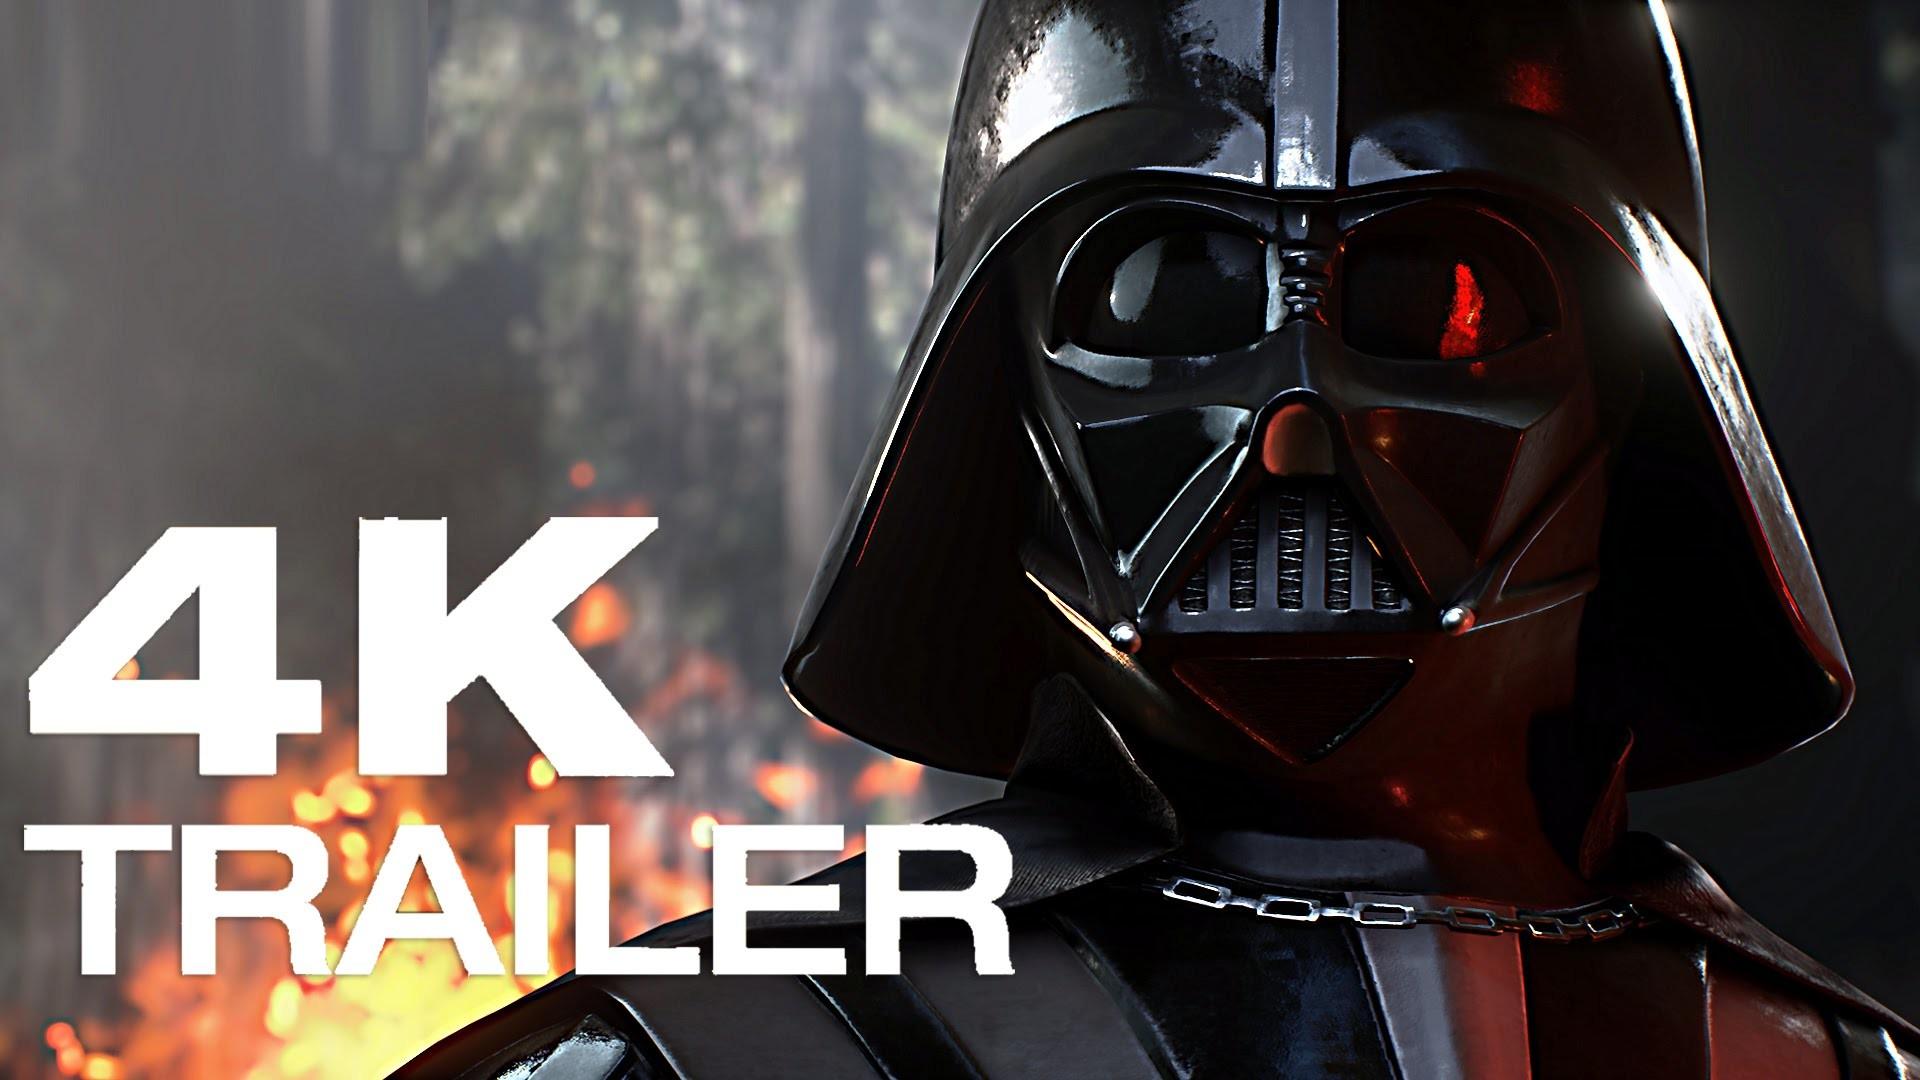 Star Wars Battlefront 3 Trailer 4K Ultra HD